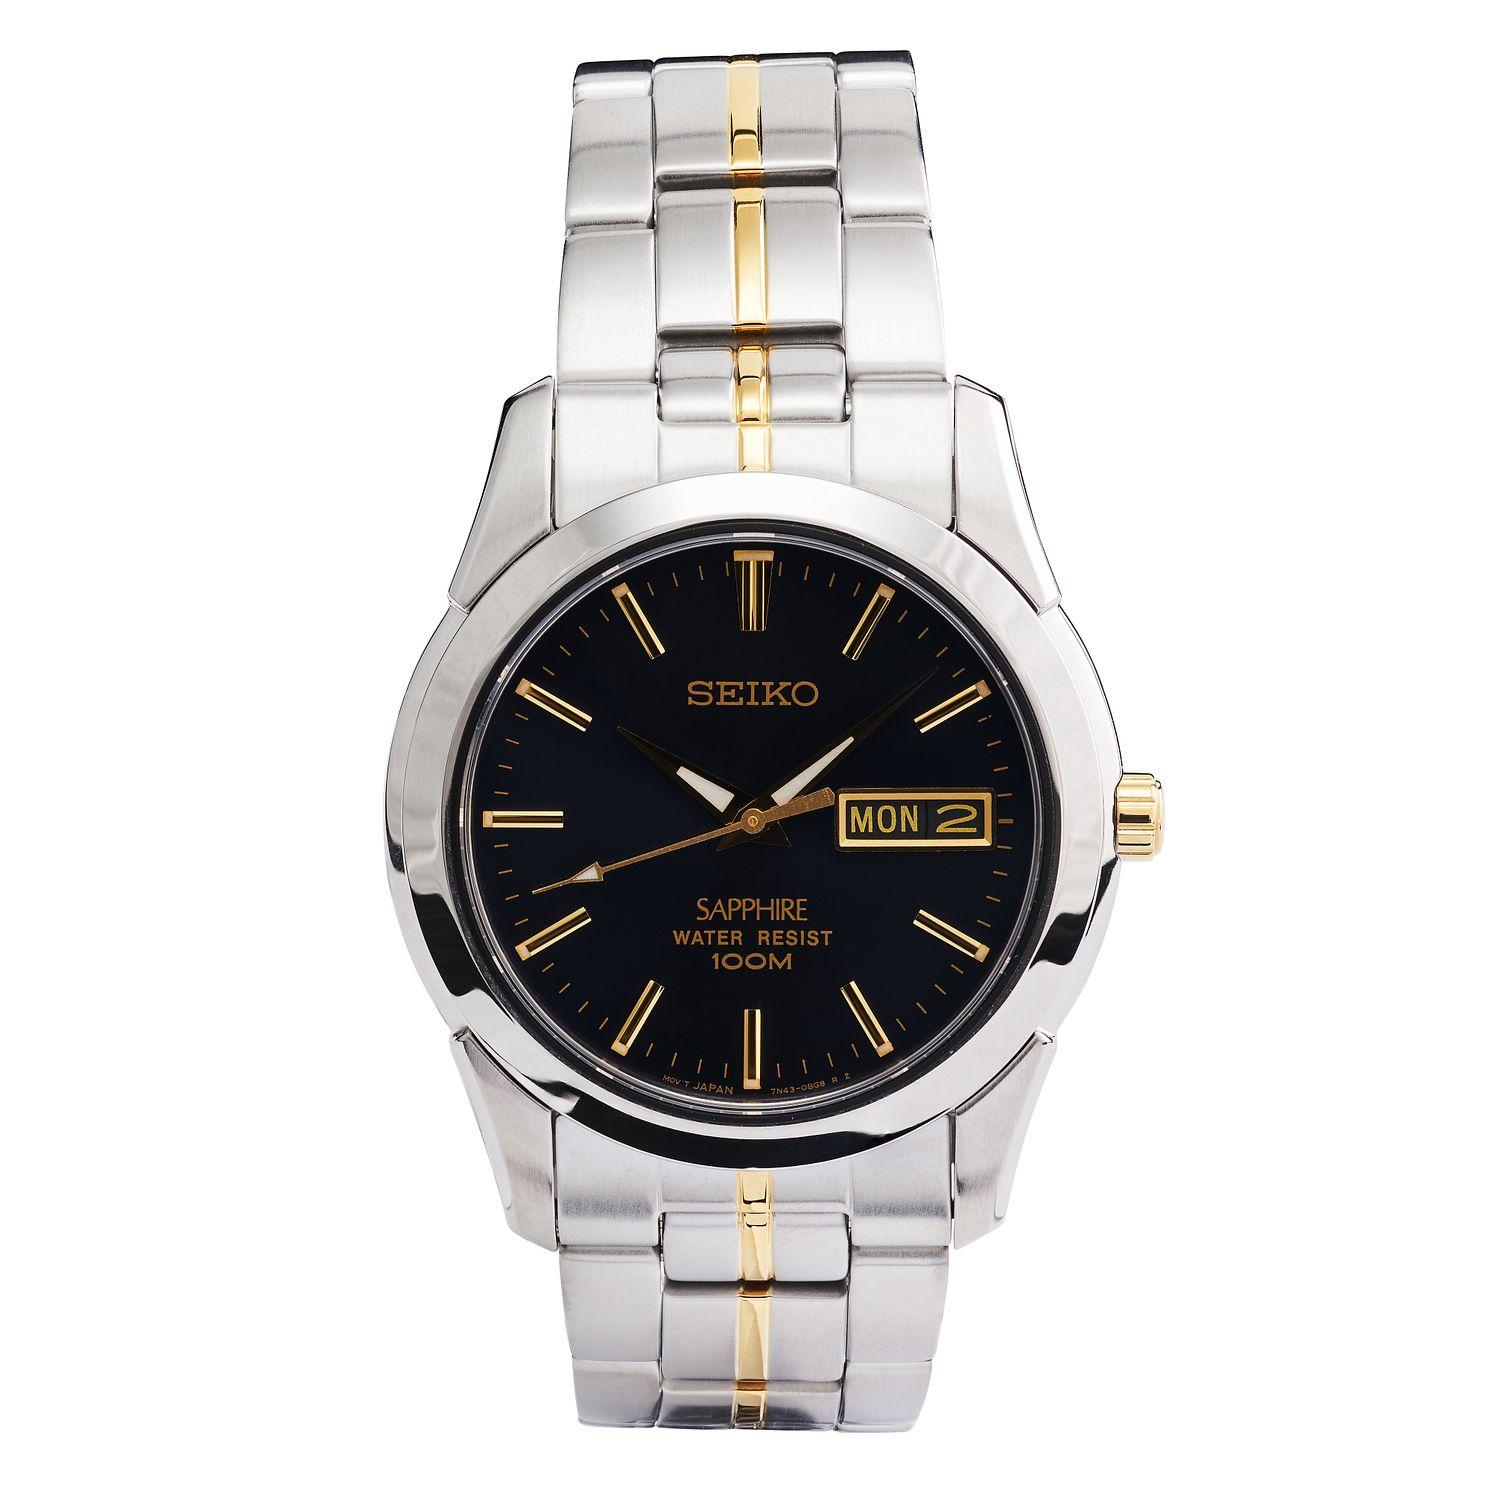 Seiko Sapphire Men's Stainless Steel Bracelet Watch, £75.65 at H.Samuel